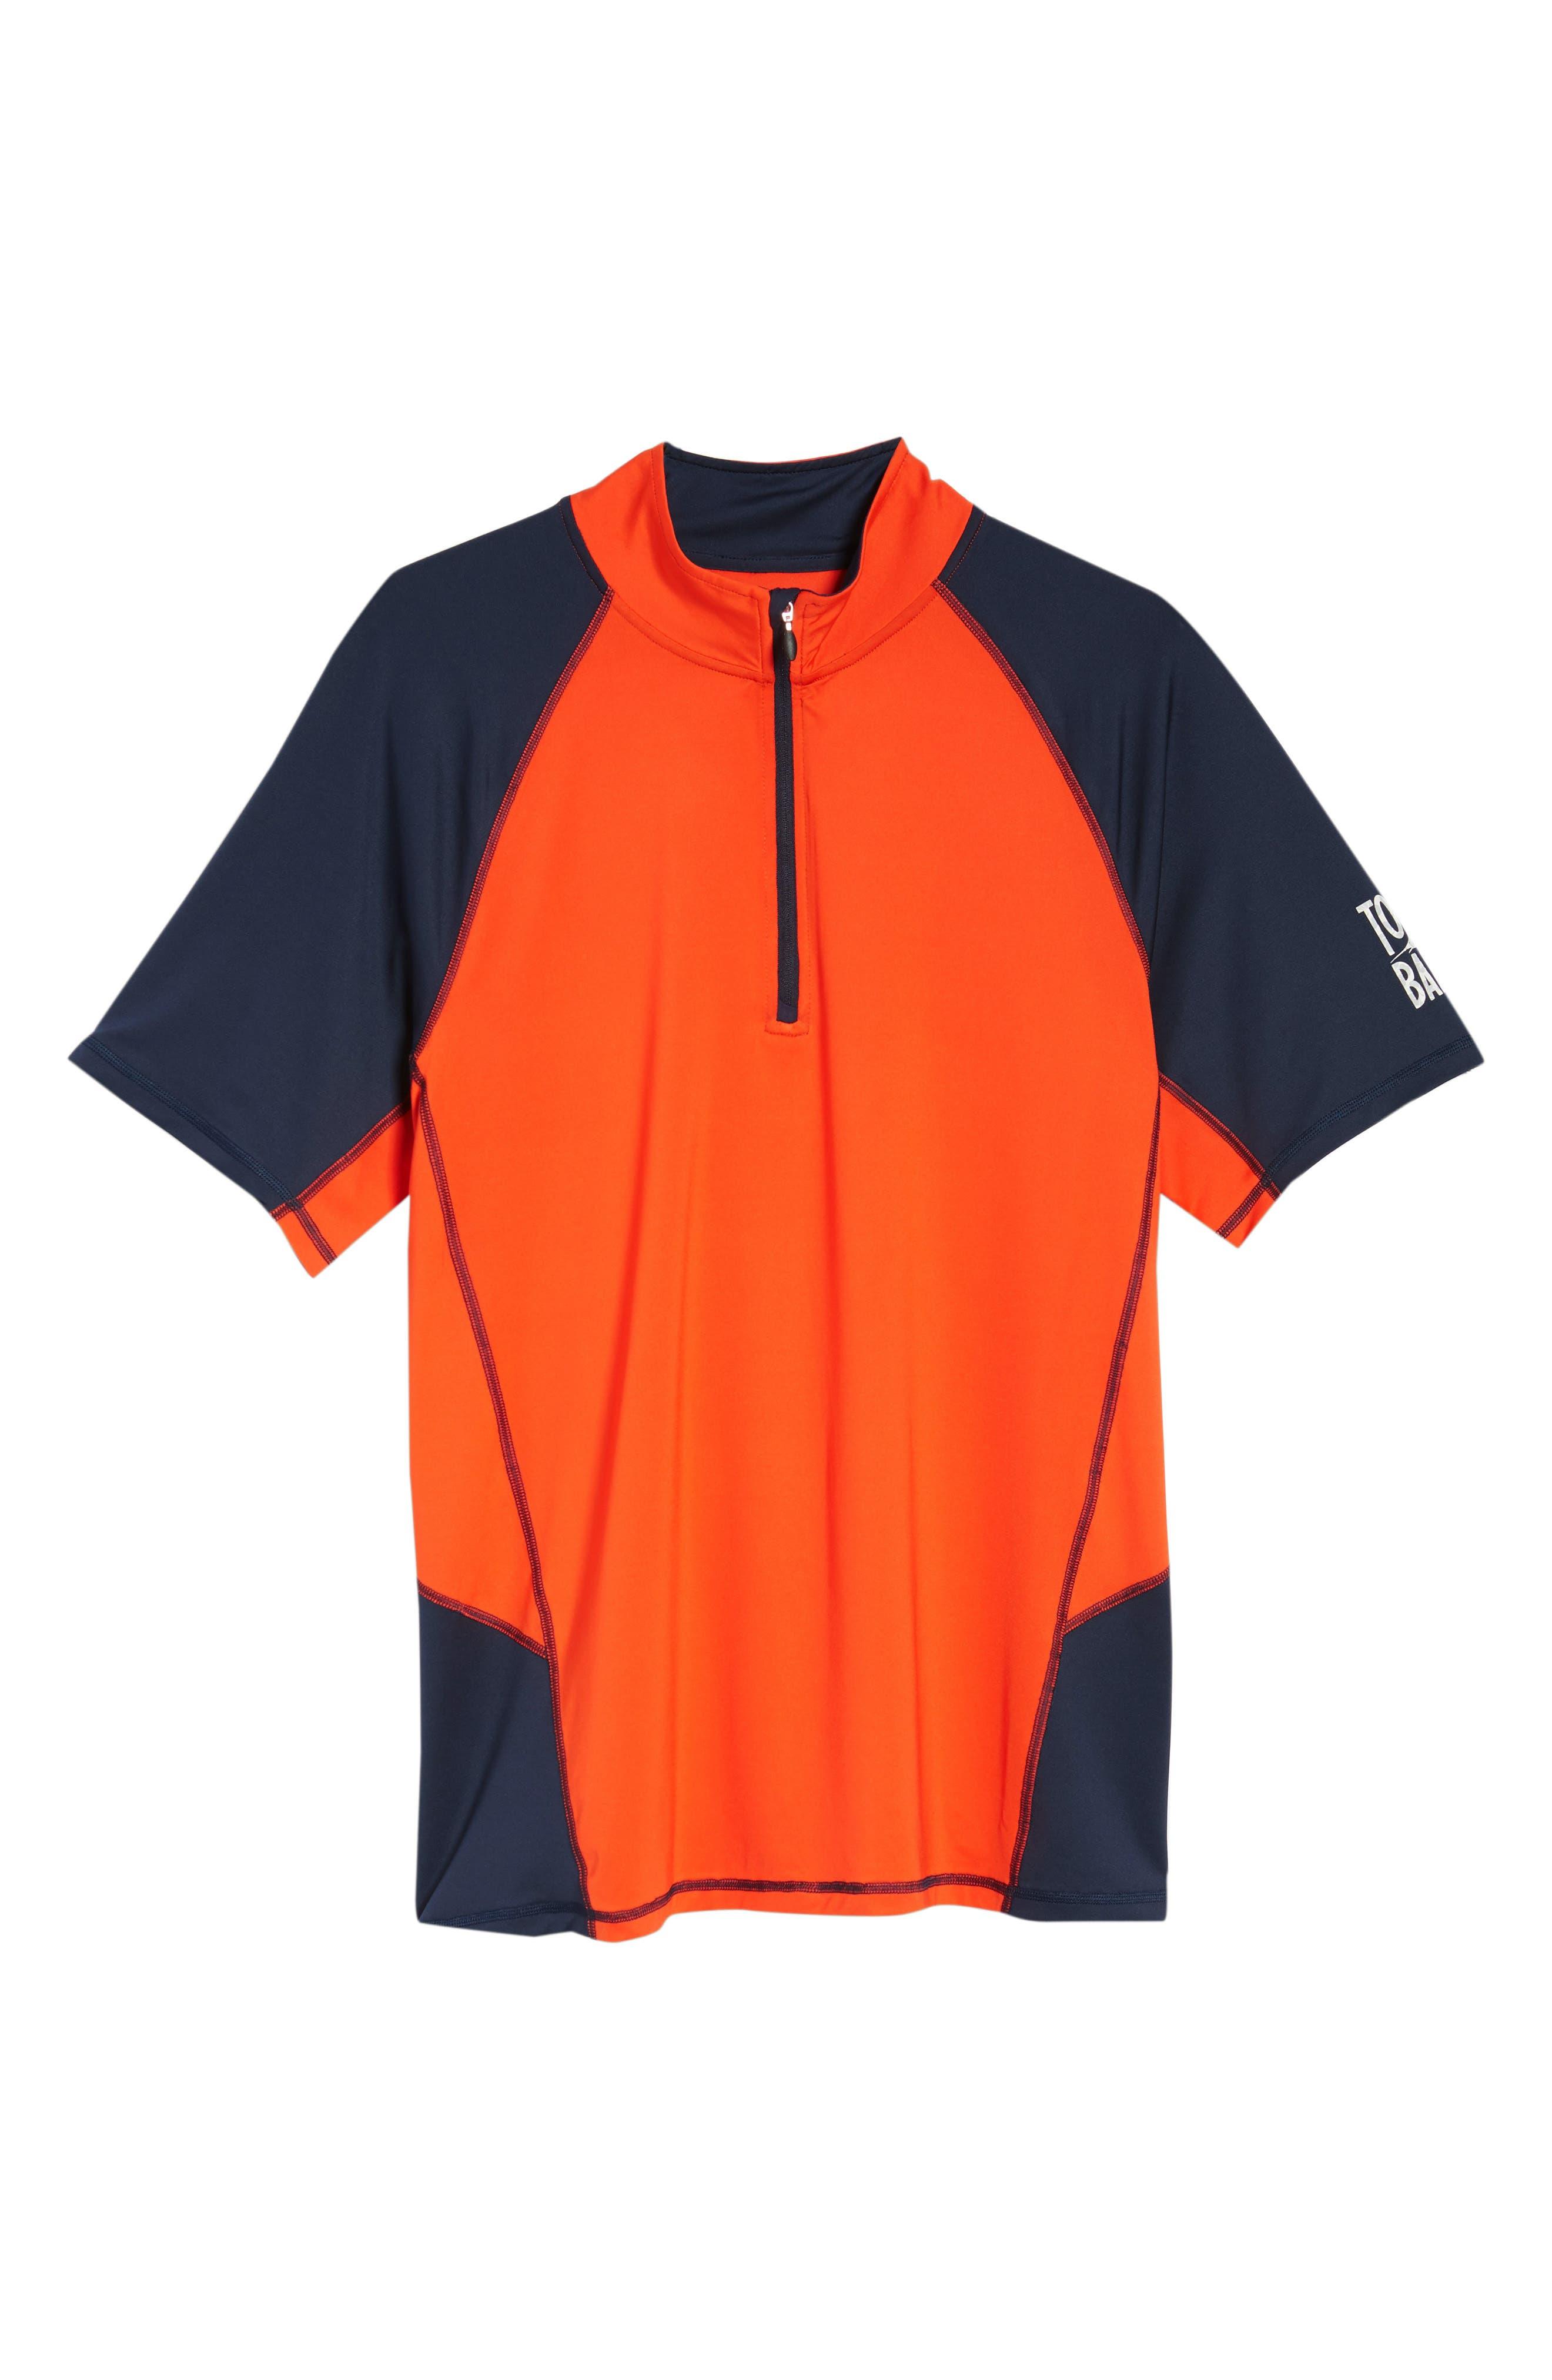 IslandActive<sup>™</sup> Colorblock Beach Pro Rashguard T-Shirt,                             Alternate thumbnail 12, color,